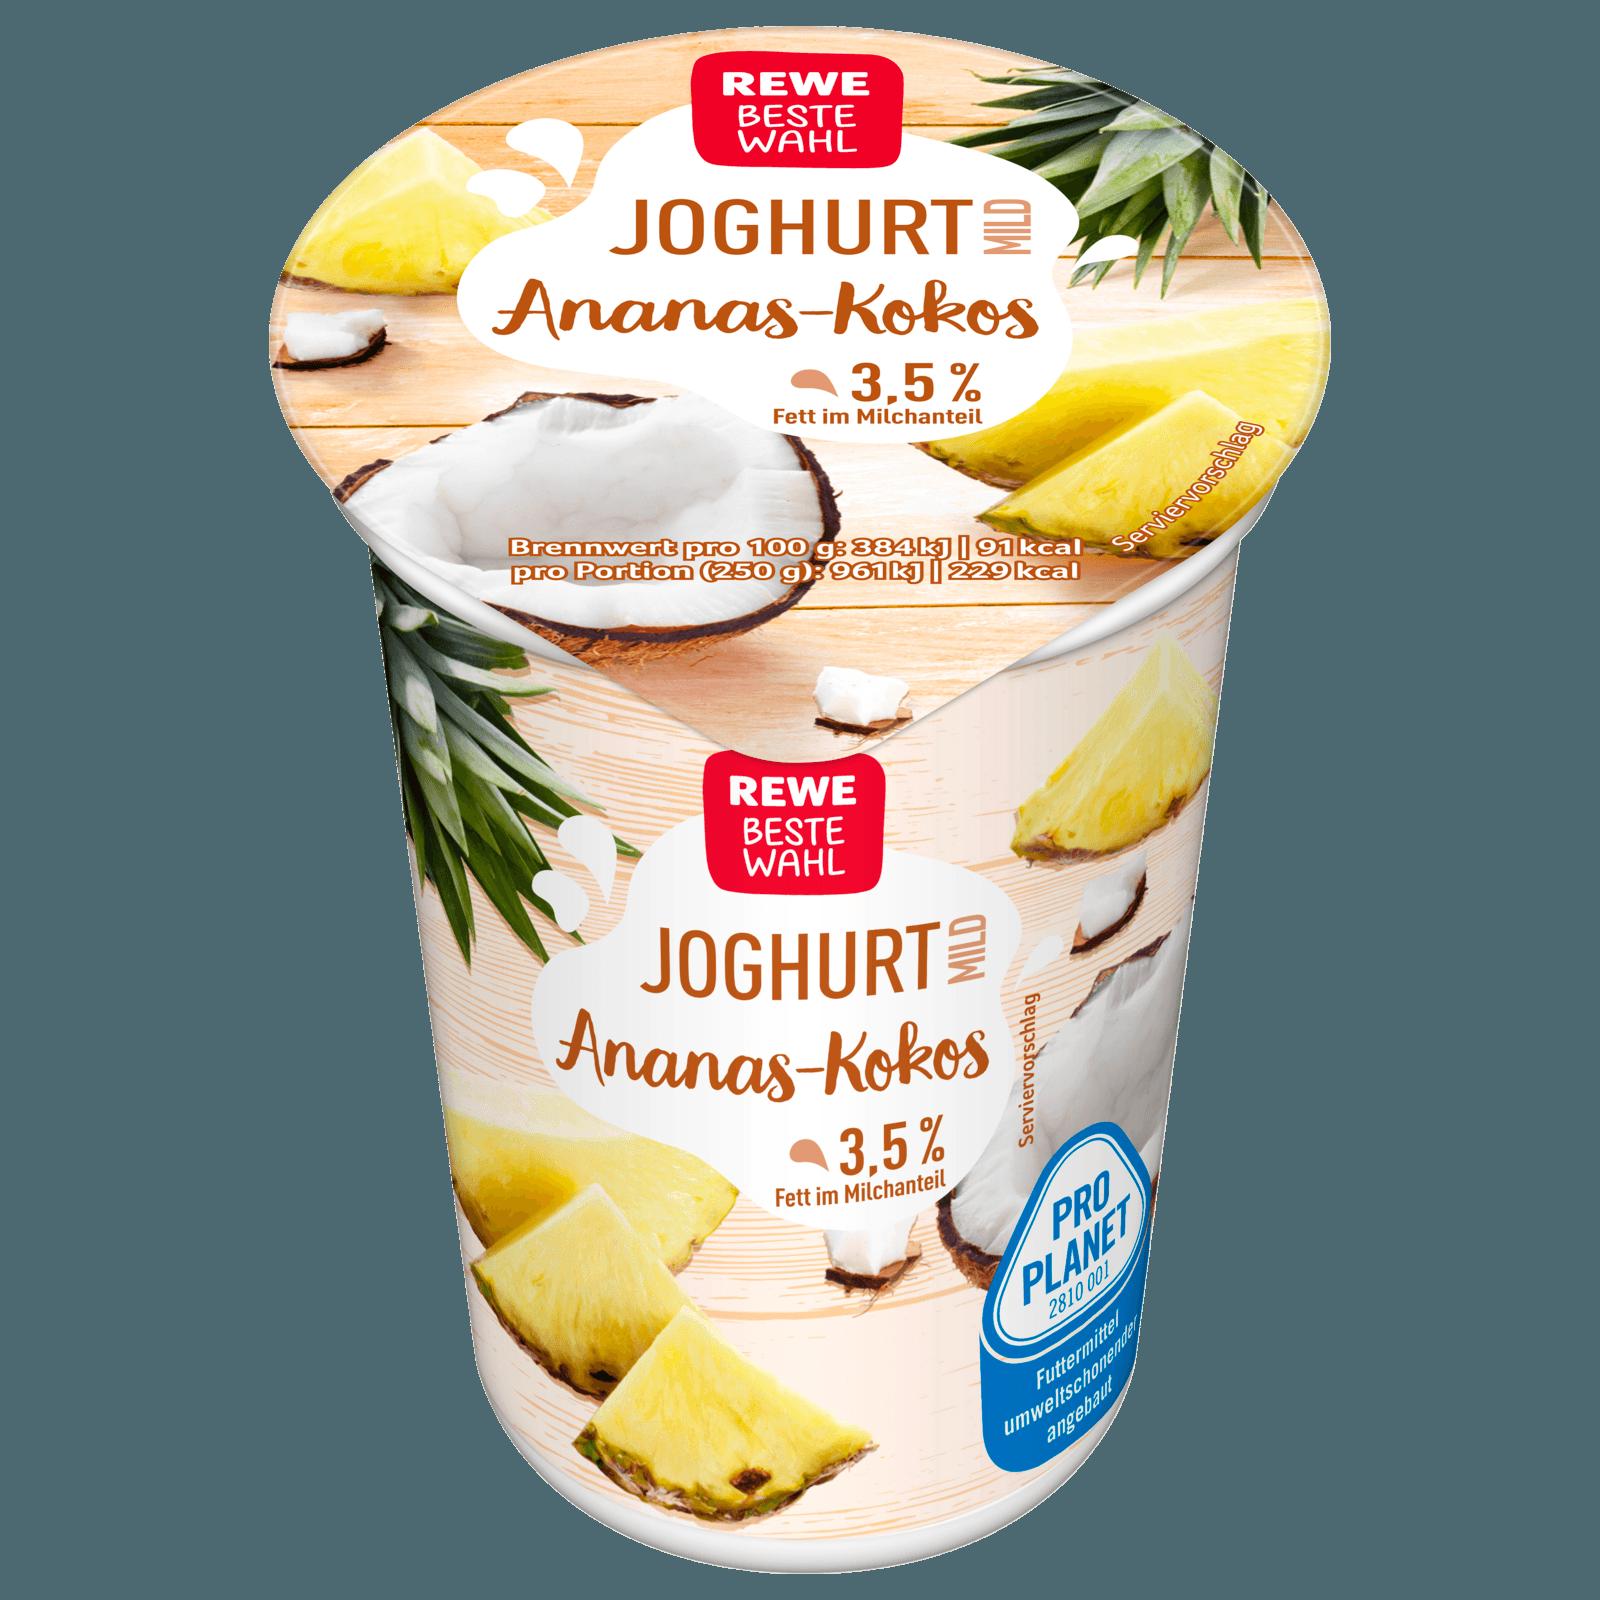 REWE Beste Wahl Joghurt mild Ananas-Kokos 250g